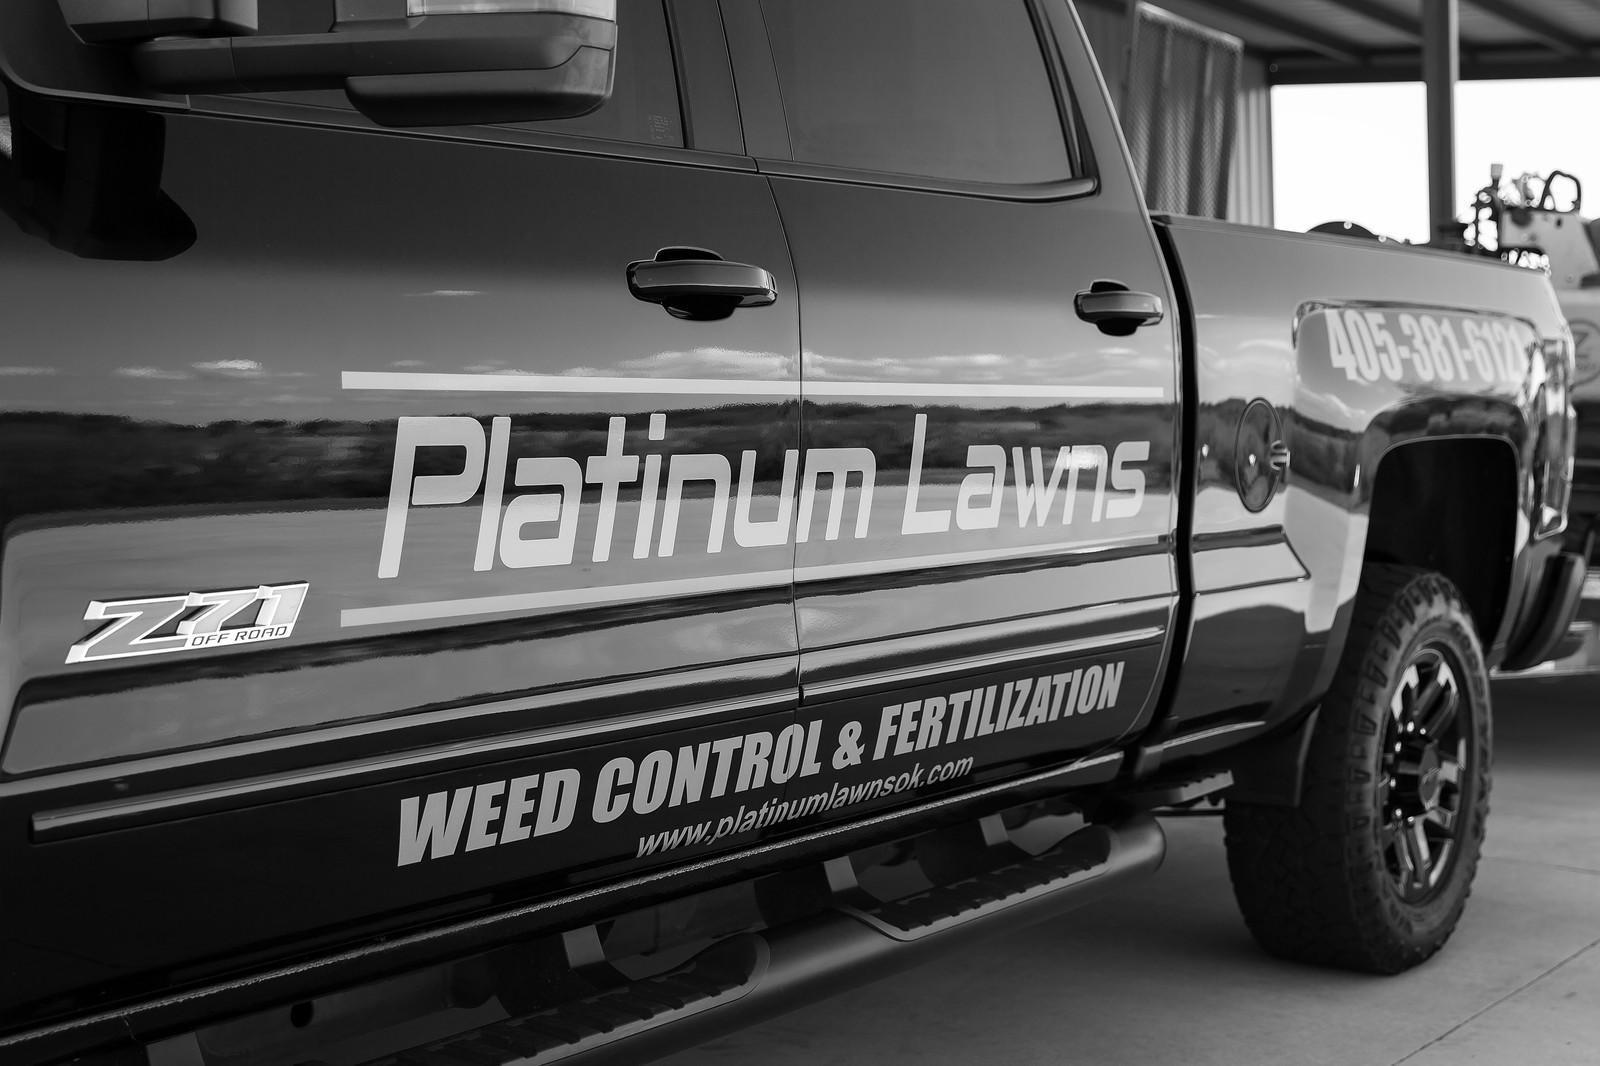 Gallery Lawn Care Platinum Lawns Okc Metro